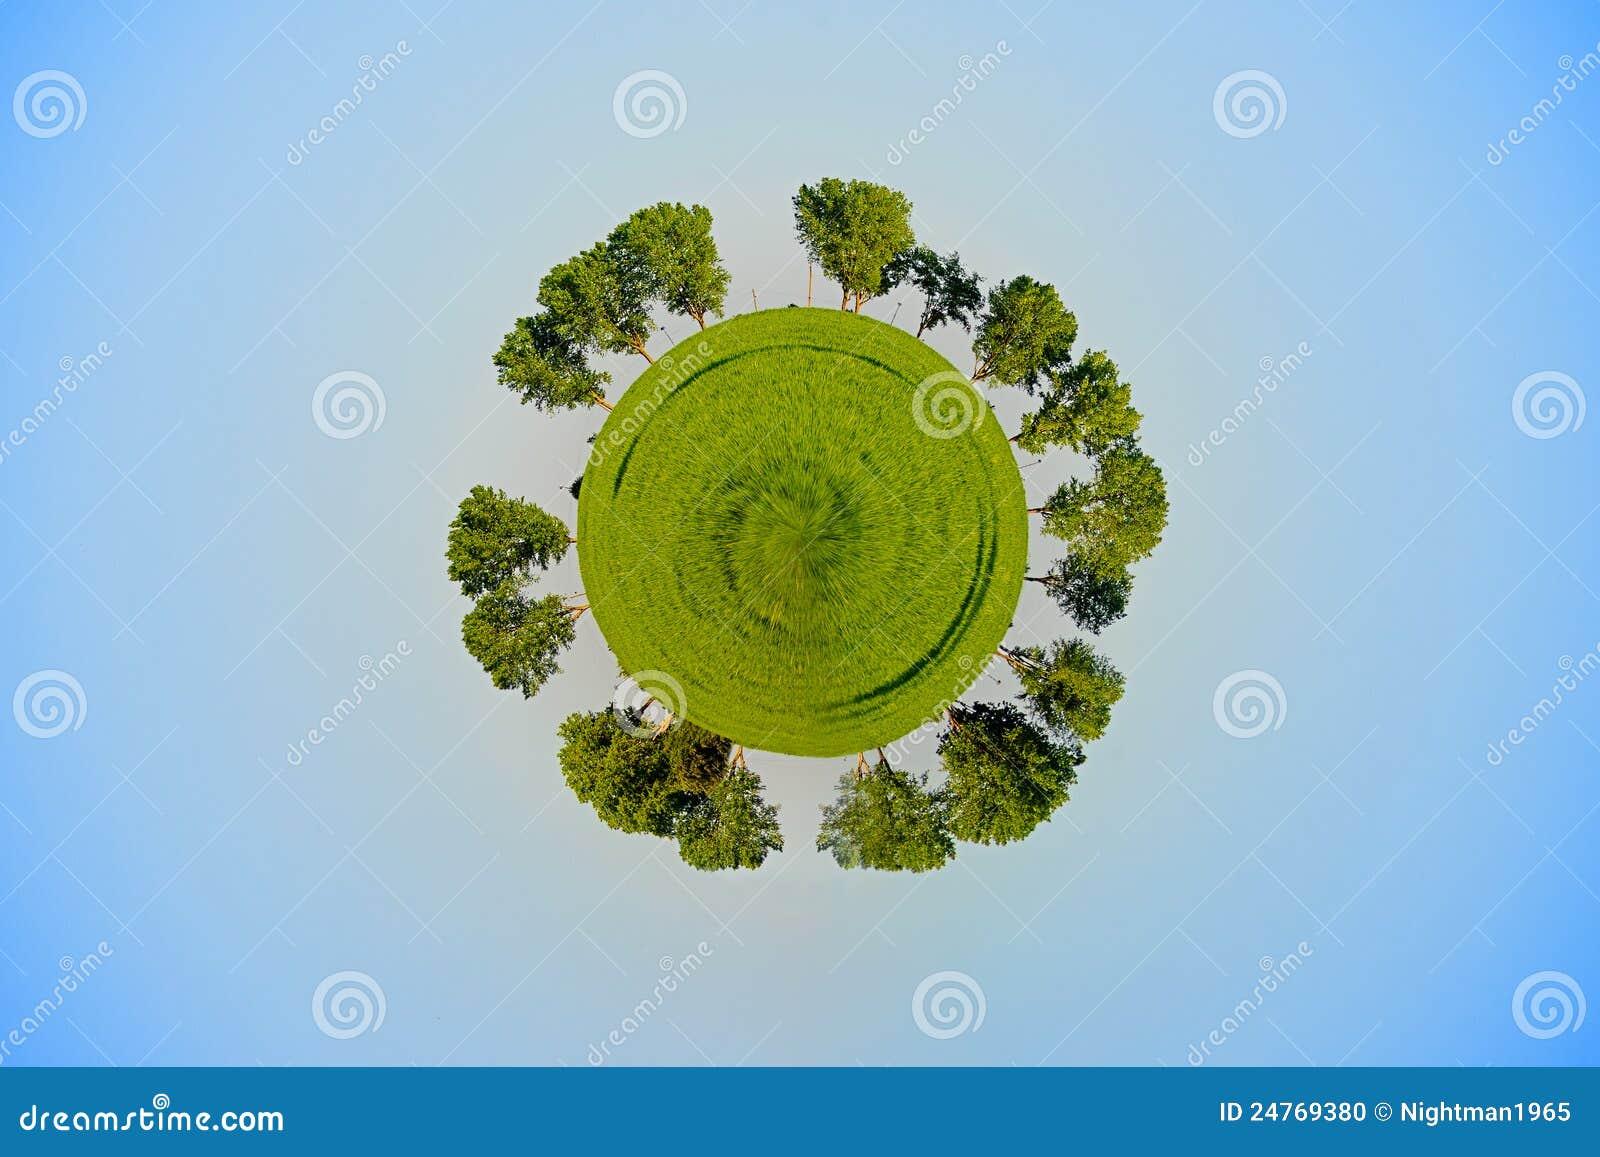 little green planet stock photo image 24769380. Black Bedroom Furniture Sets. Home Design Ideas